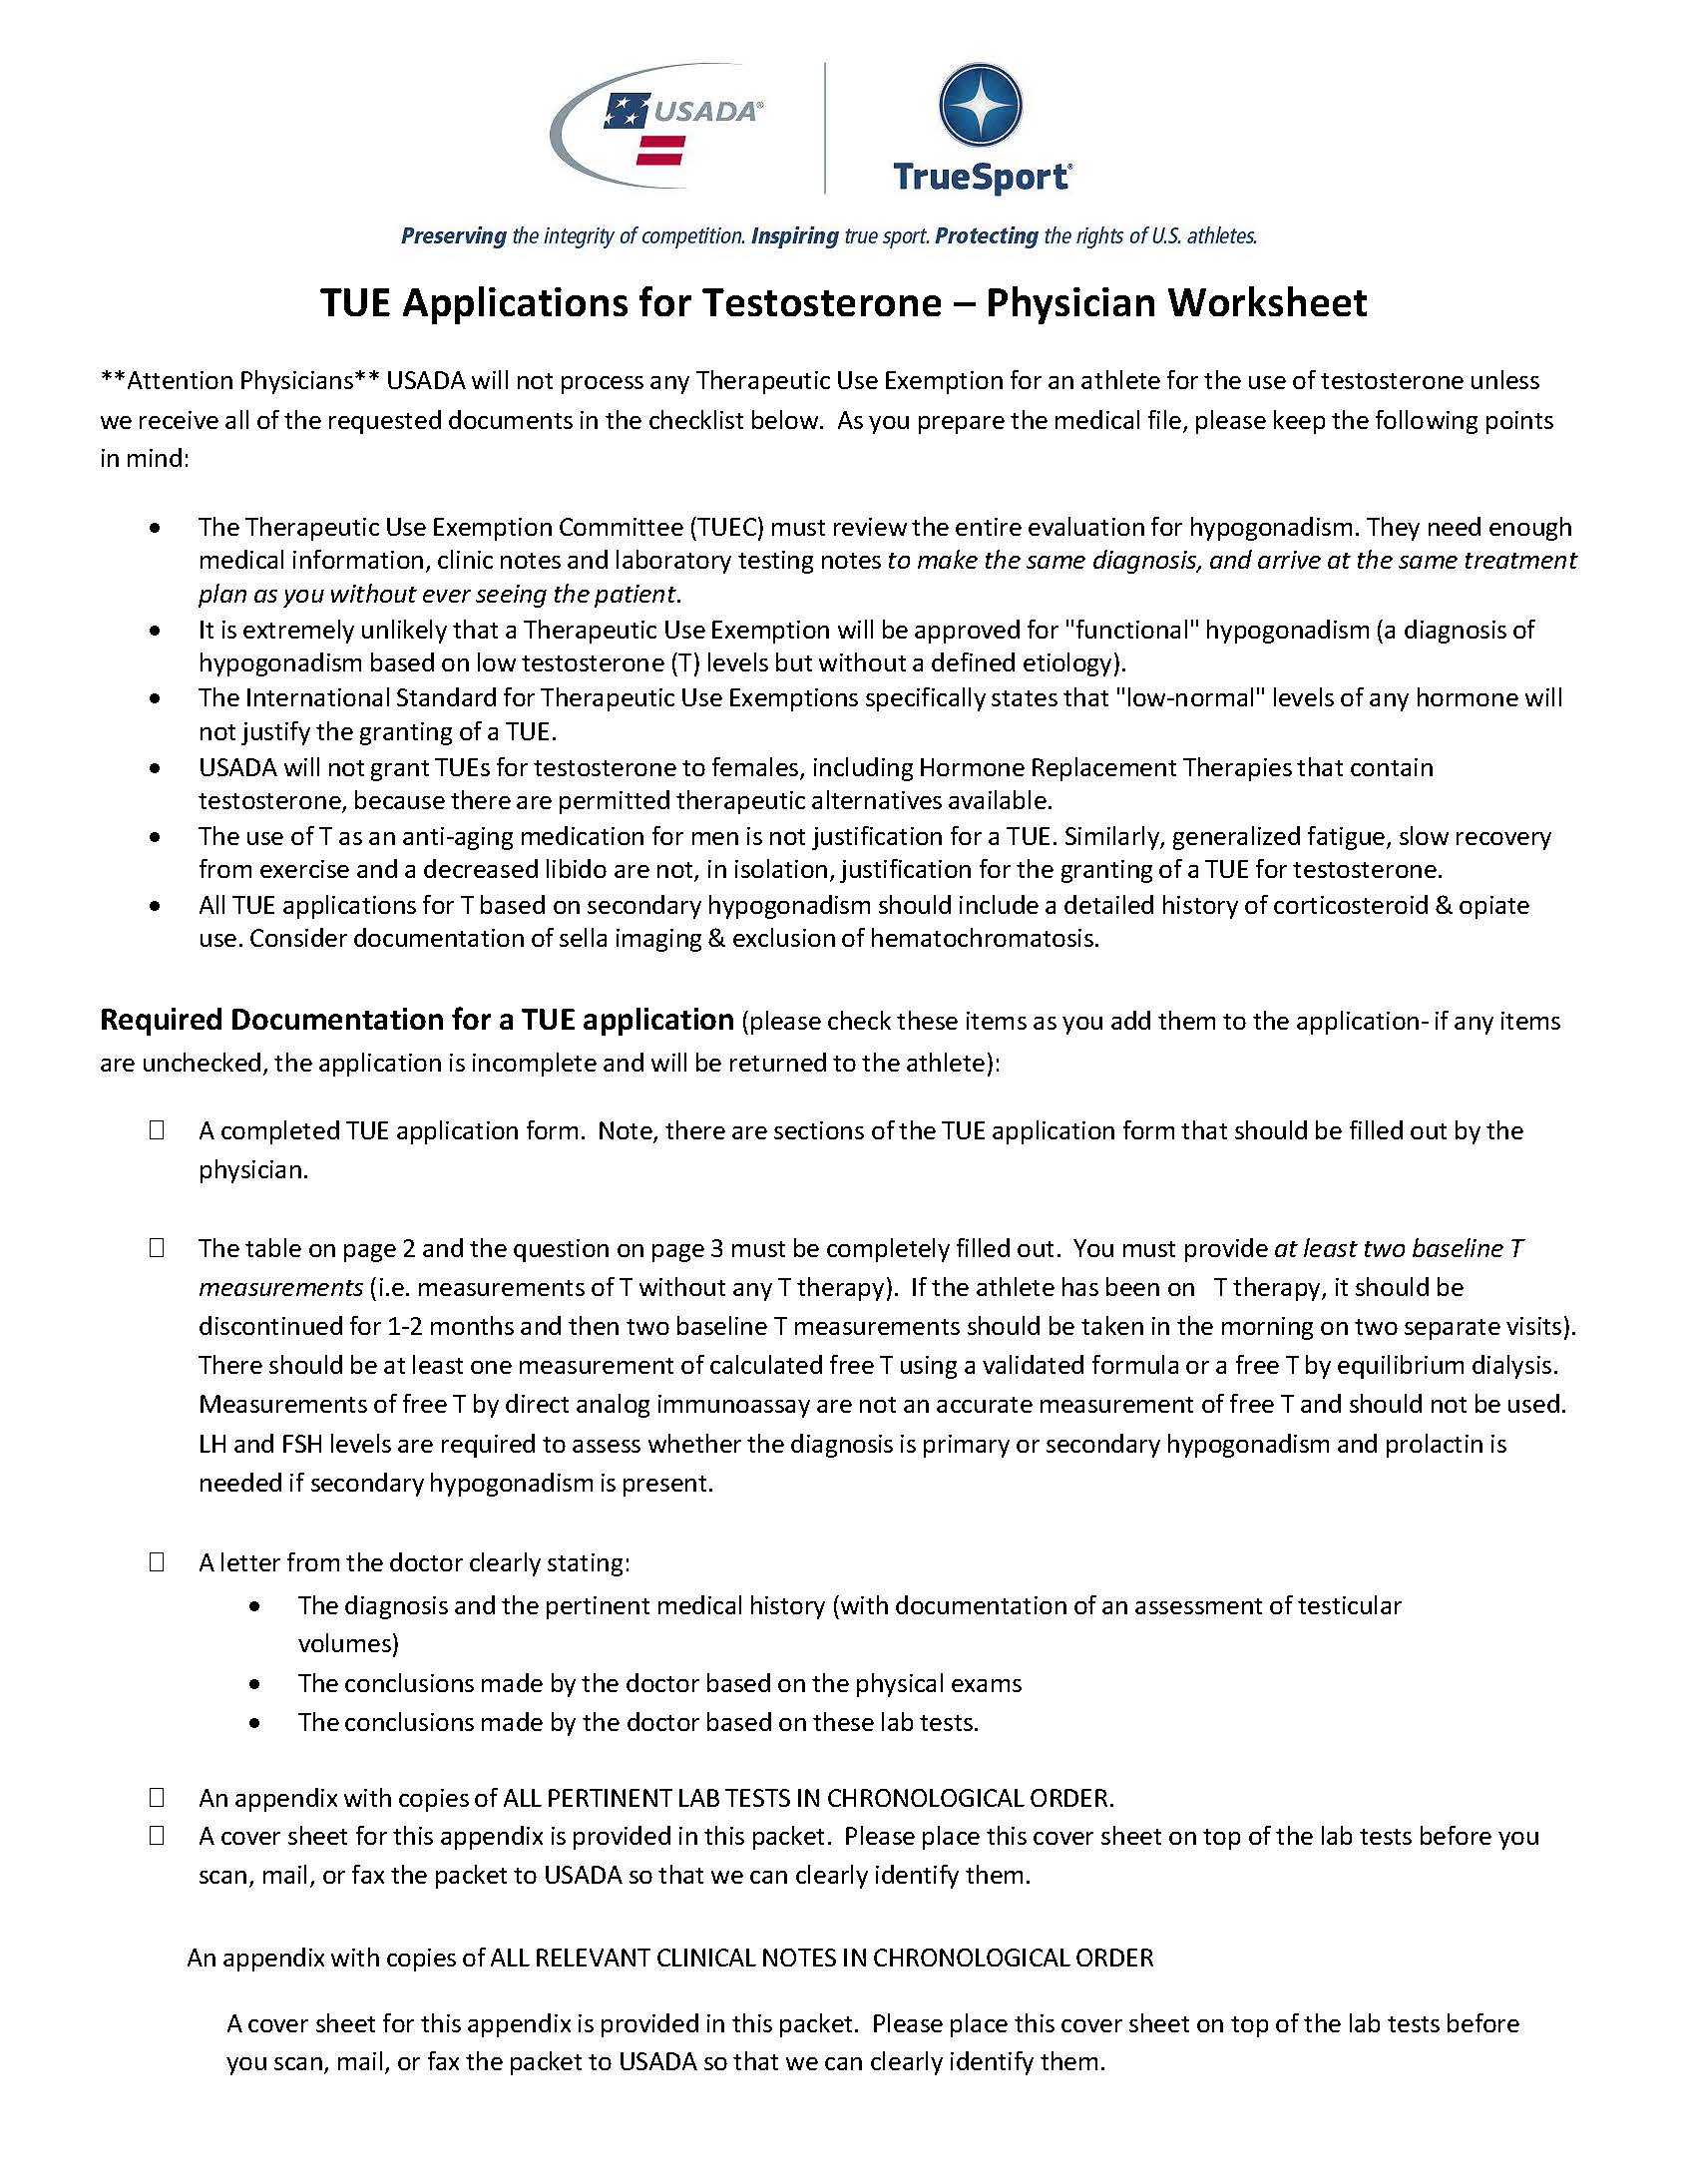 TUE_guidance_androgen_deficiency_male_hypogonadism-testosterone